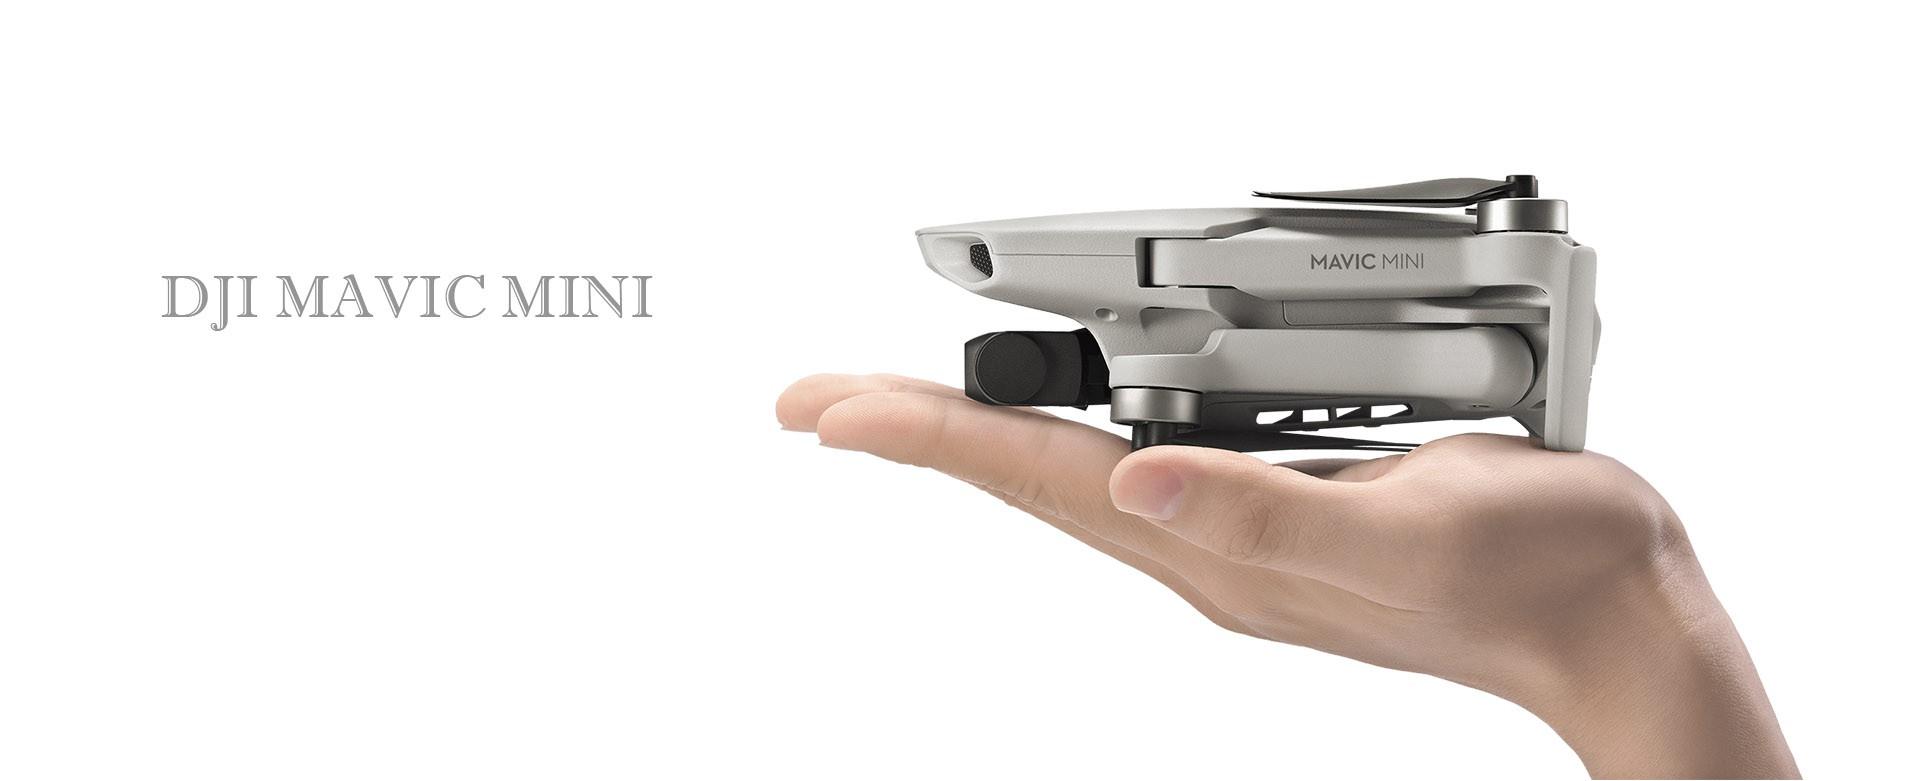 Mavic Mini Drone   AeroCam.bg